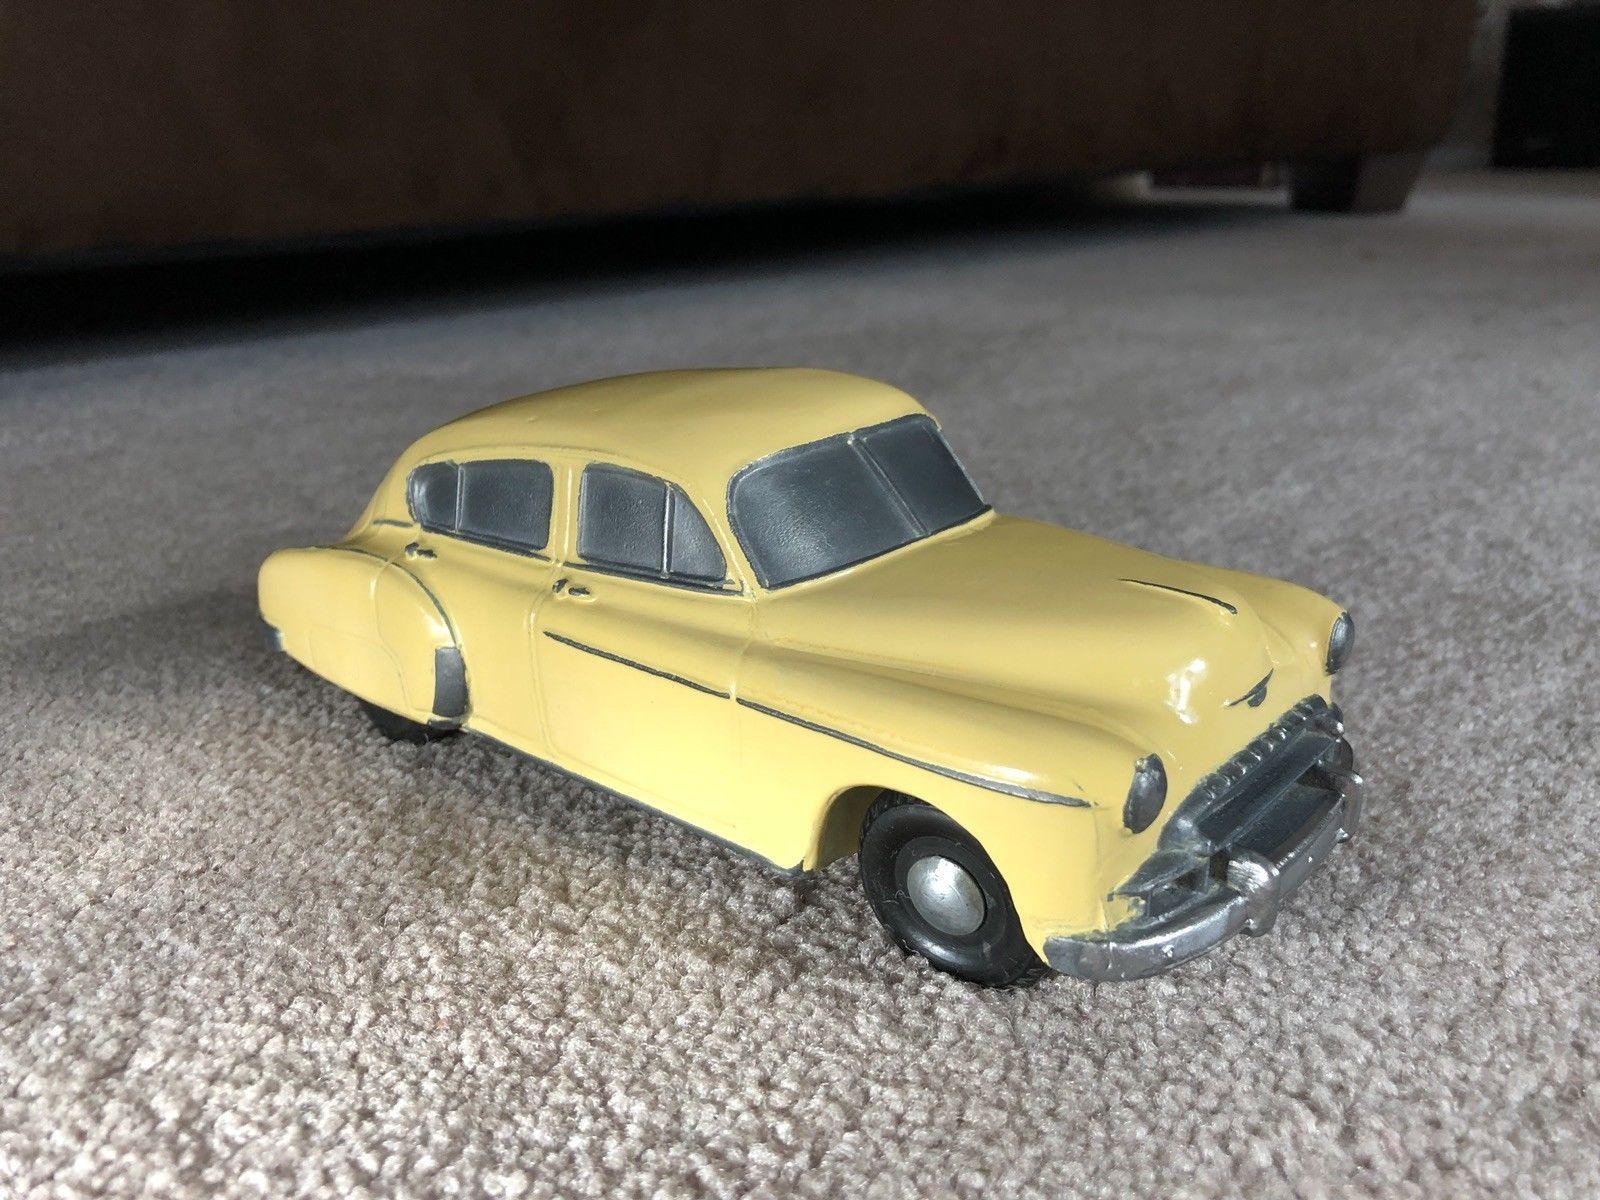 1950 Chevy Fleetline 4 Door Sedan Banthrico Promo Model Promotional Model Car Model Scale Models